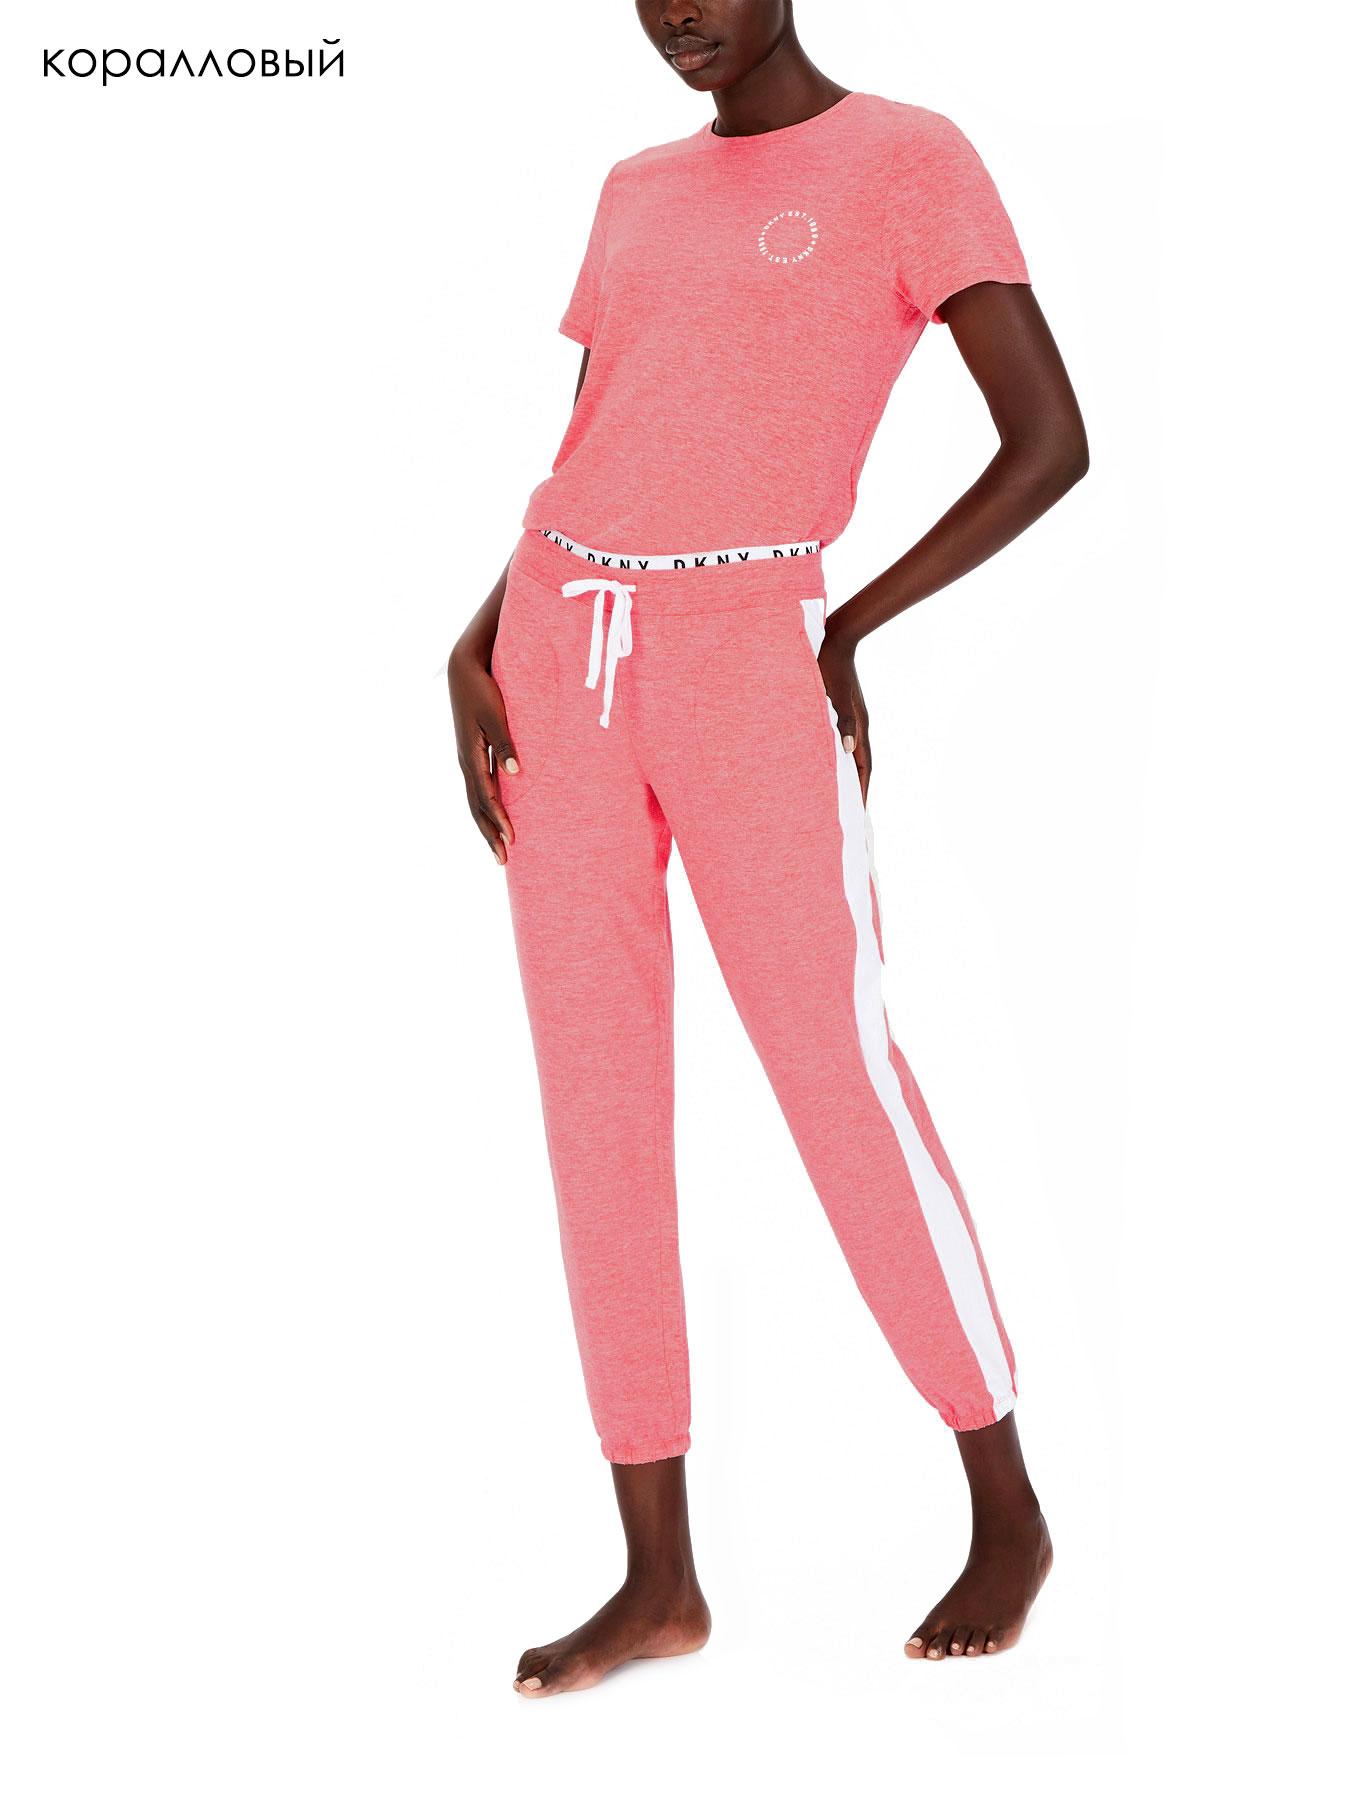 Трикотажный комплект (футболка, брюки) YI2422471/2722471 DKNY